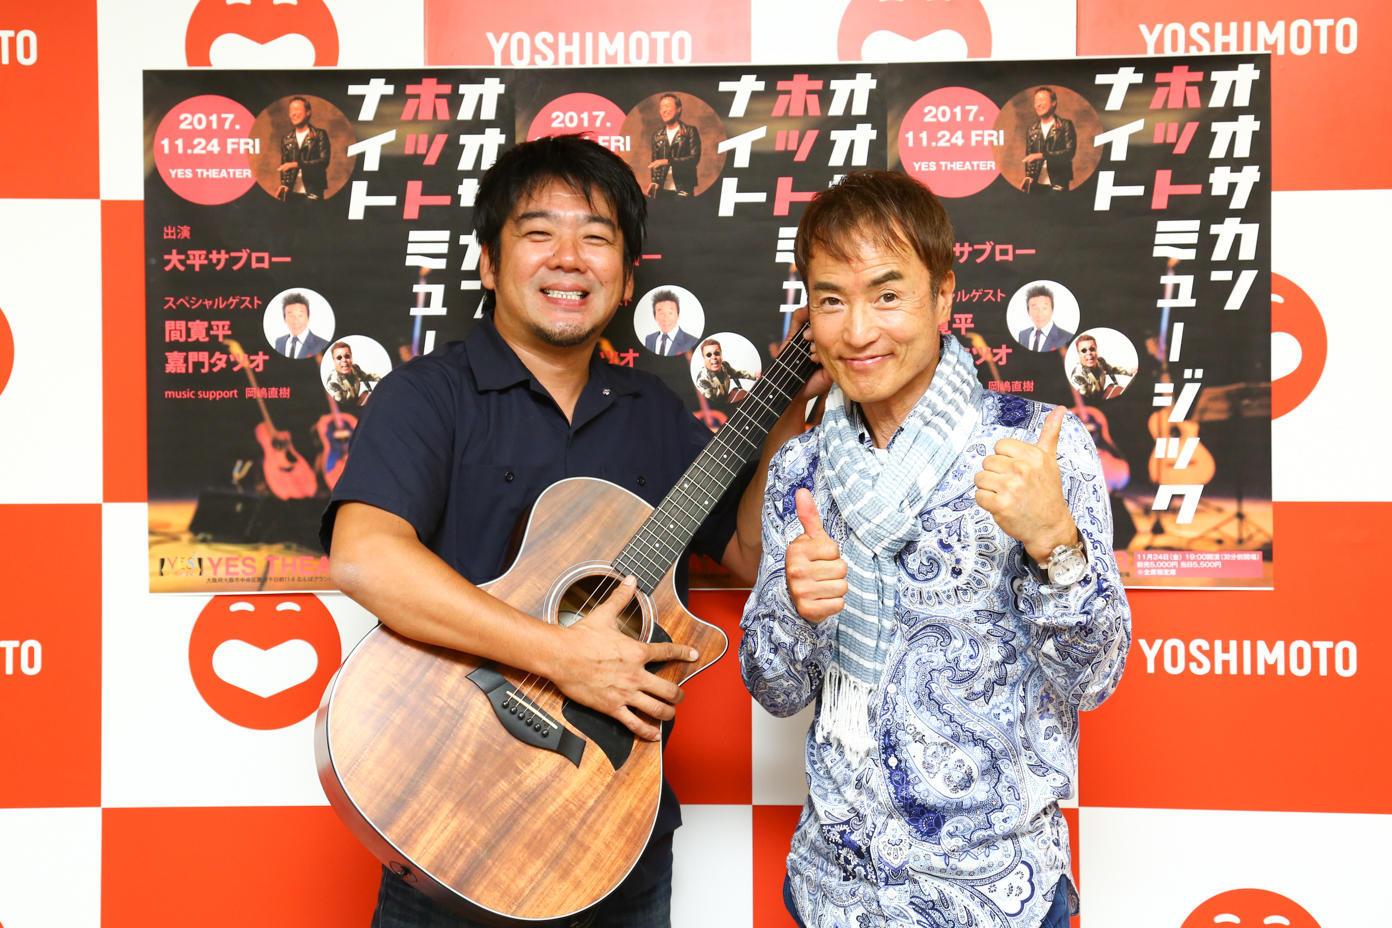 http://news.yoshimoto.co.jp/20170929092816-322c6f92e6ebbe310239512139c7219a5dad3474.jpg